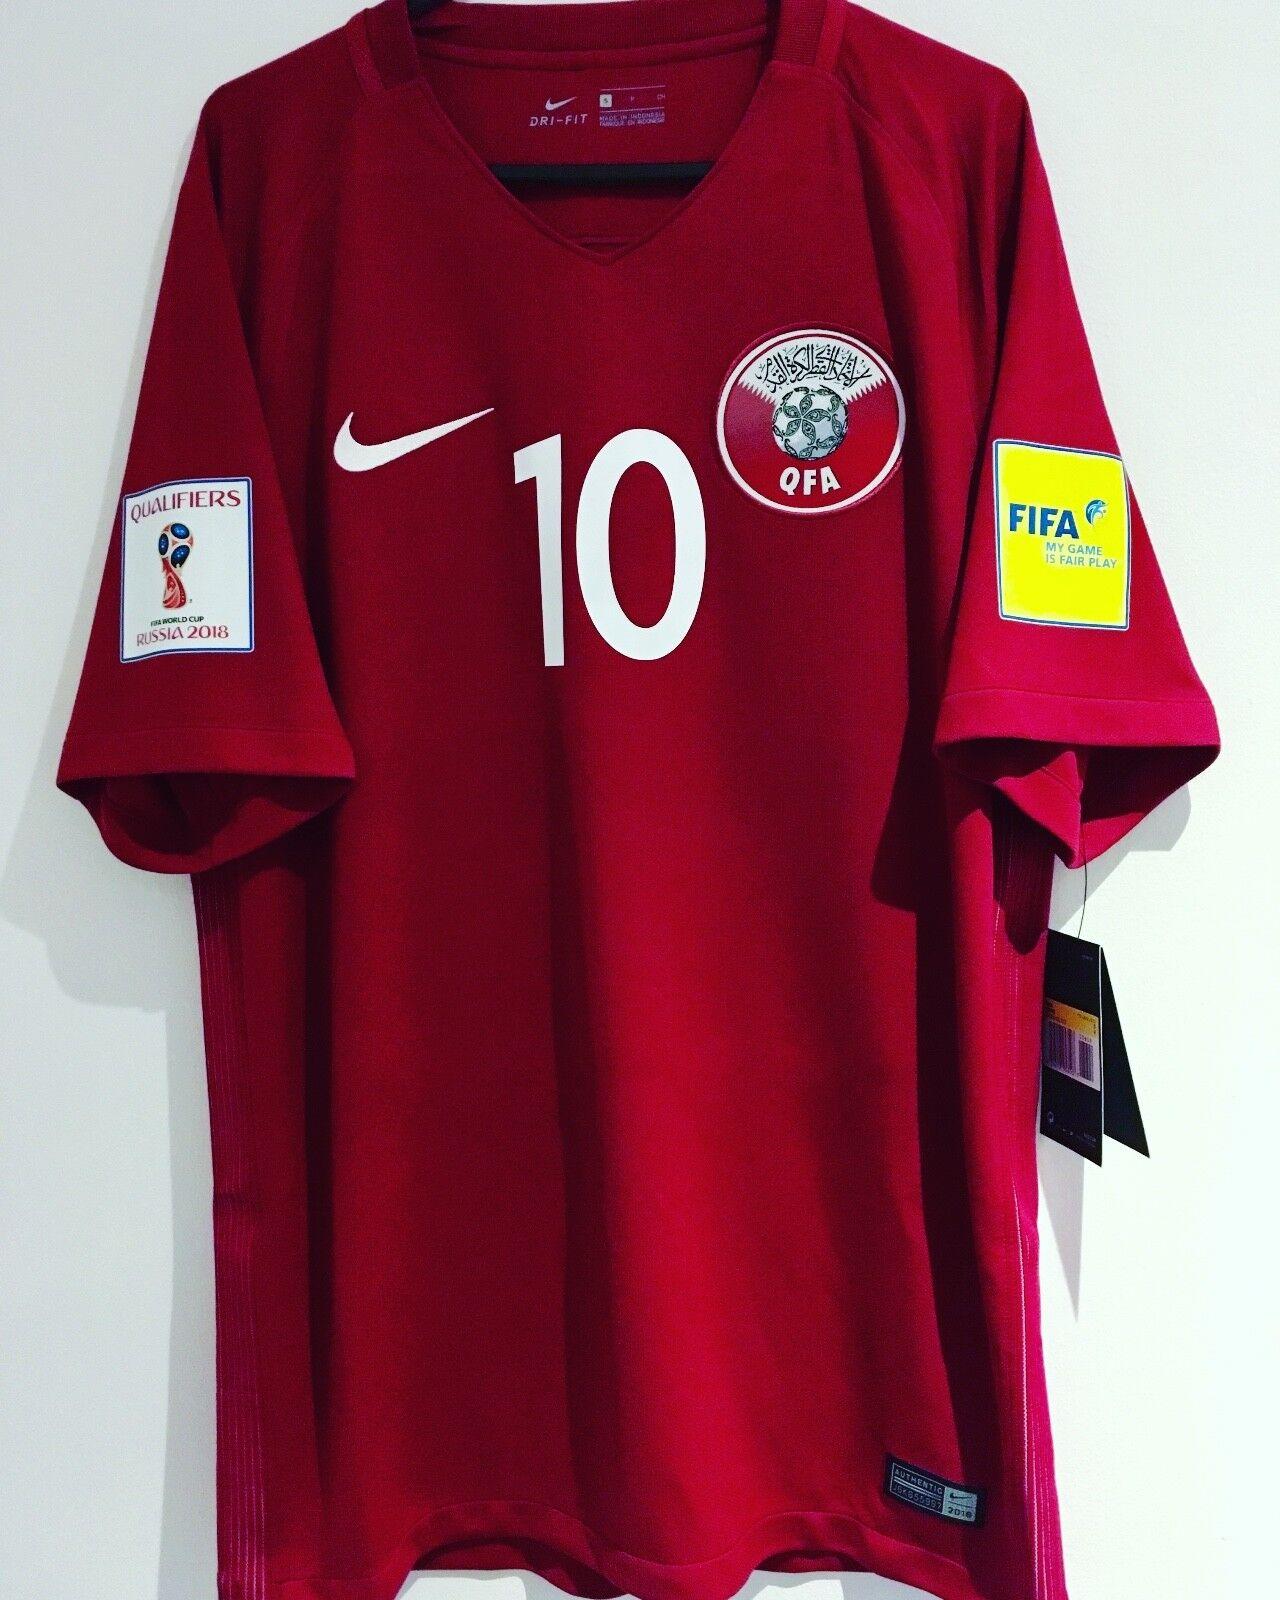 BNWT  1718 Qatar Camicia  10 alhaidos Taglia S